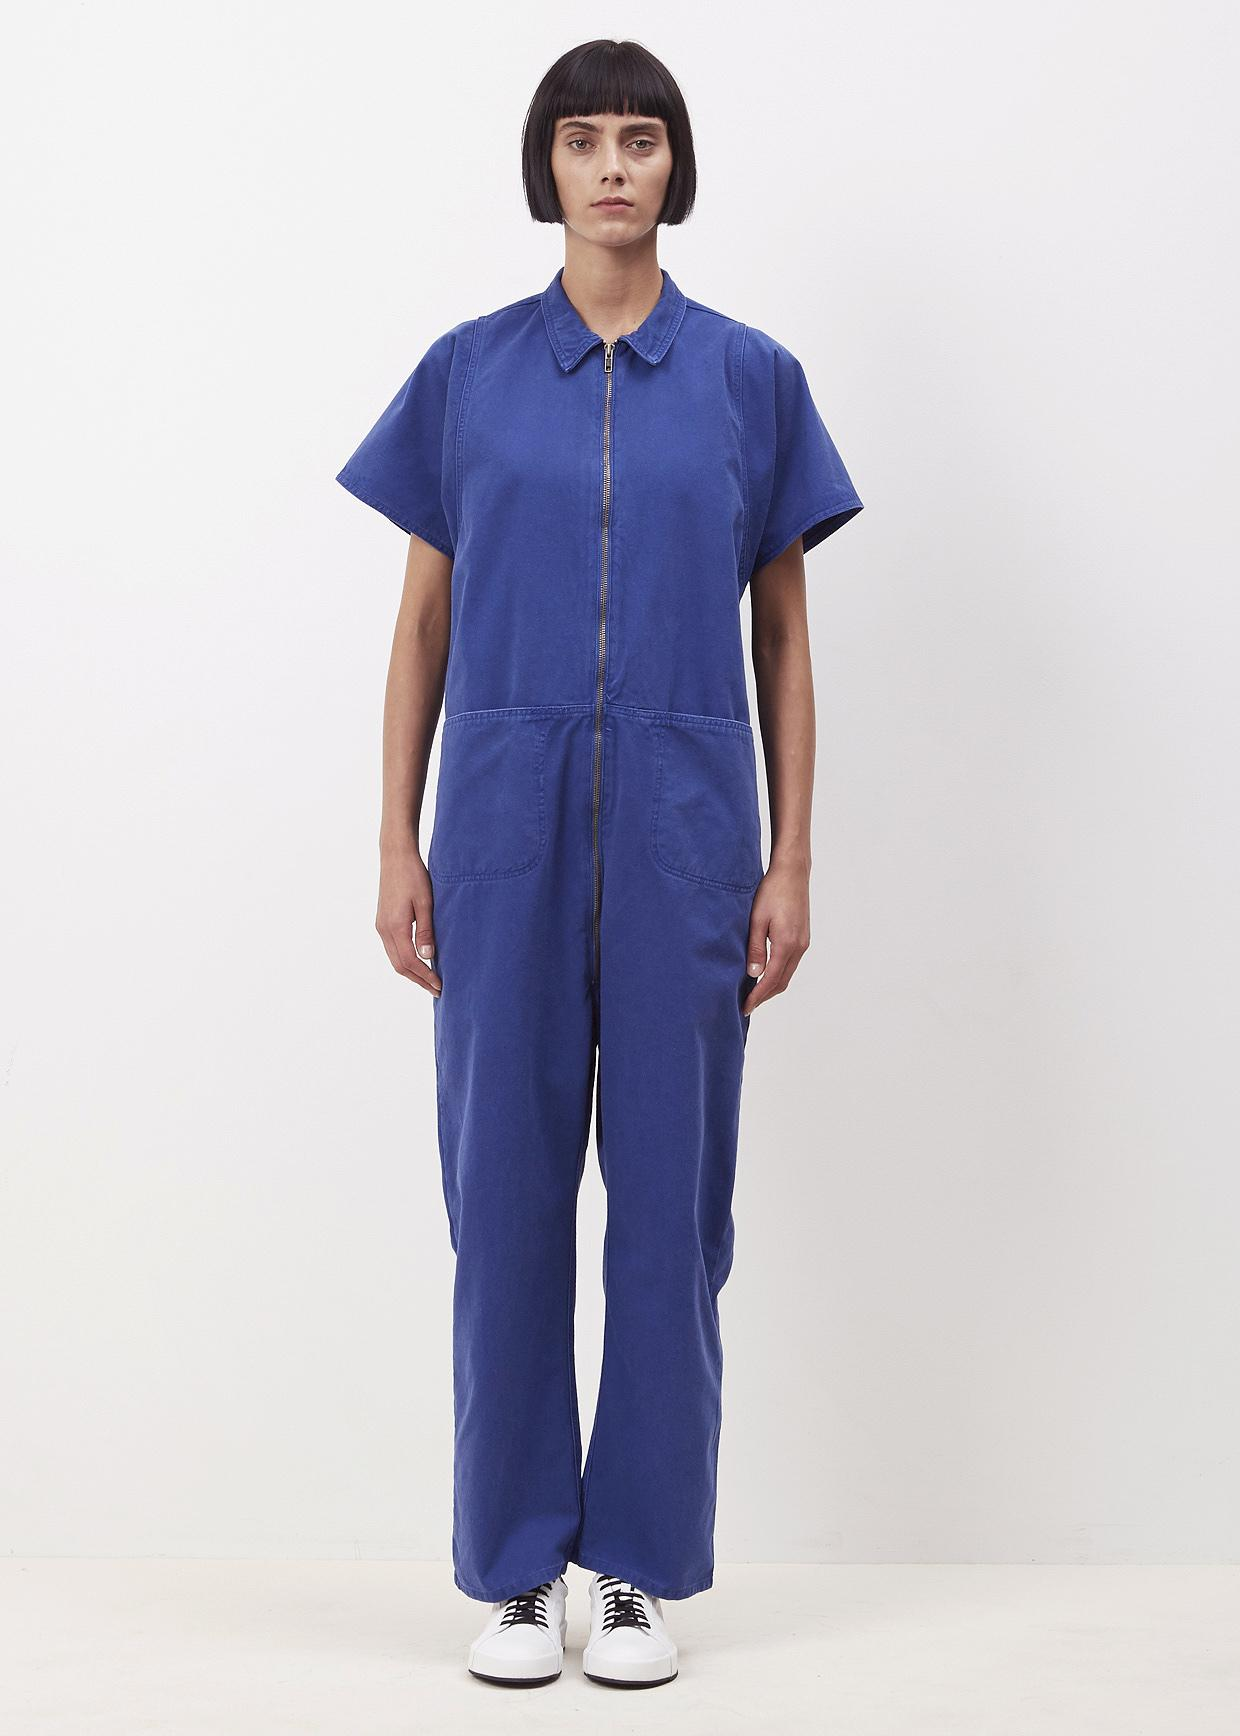 4afe11d82382 Lyst - Rachel Comey Gitane Barrie Jumpsuit in Blue